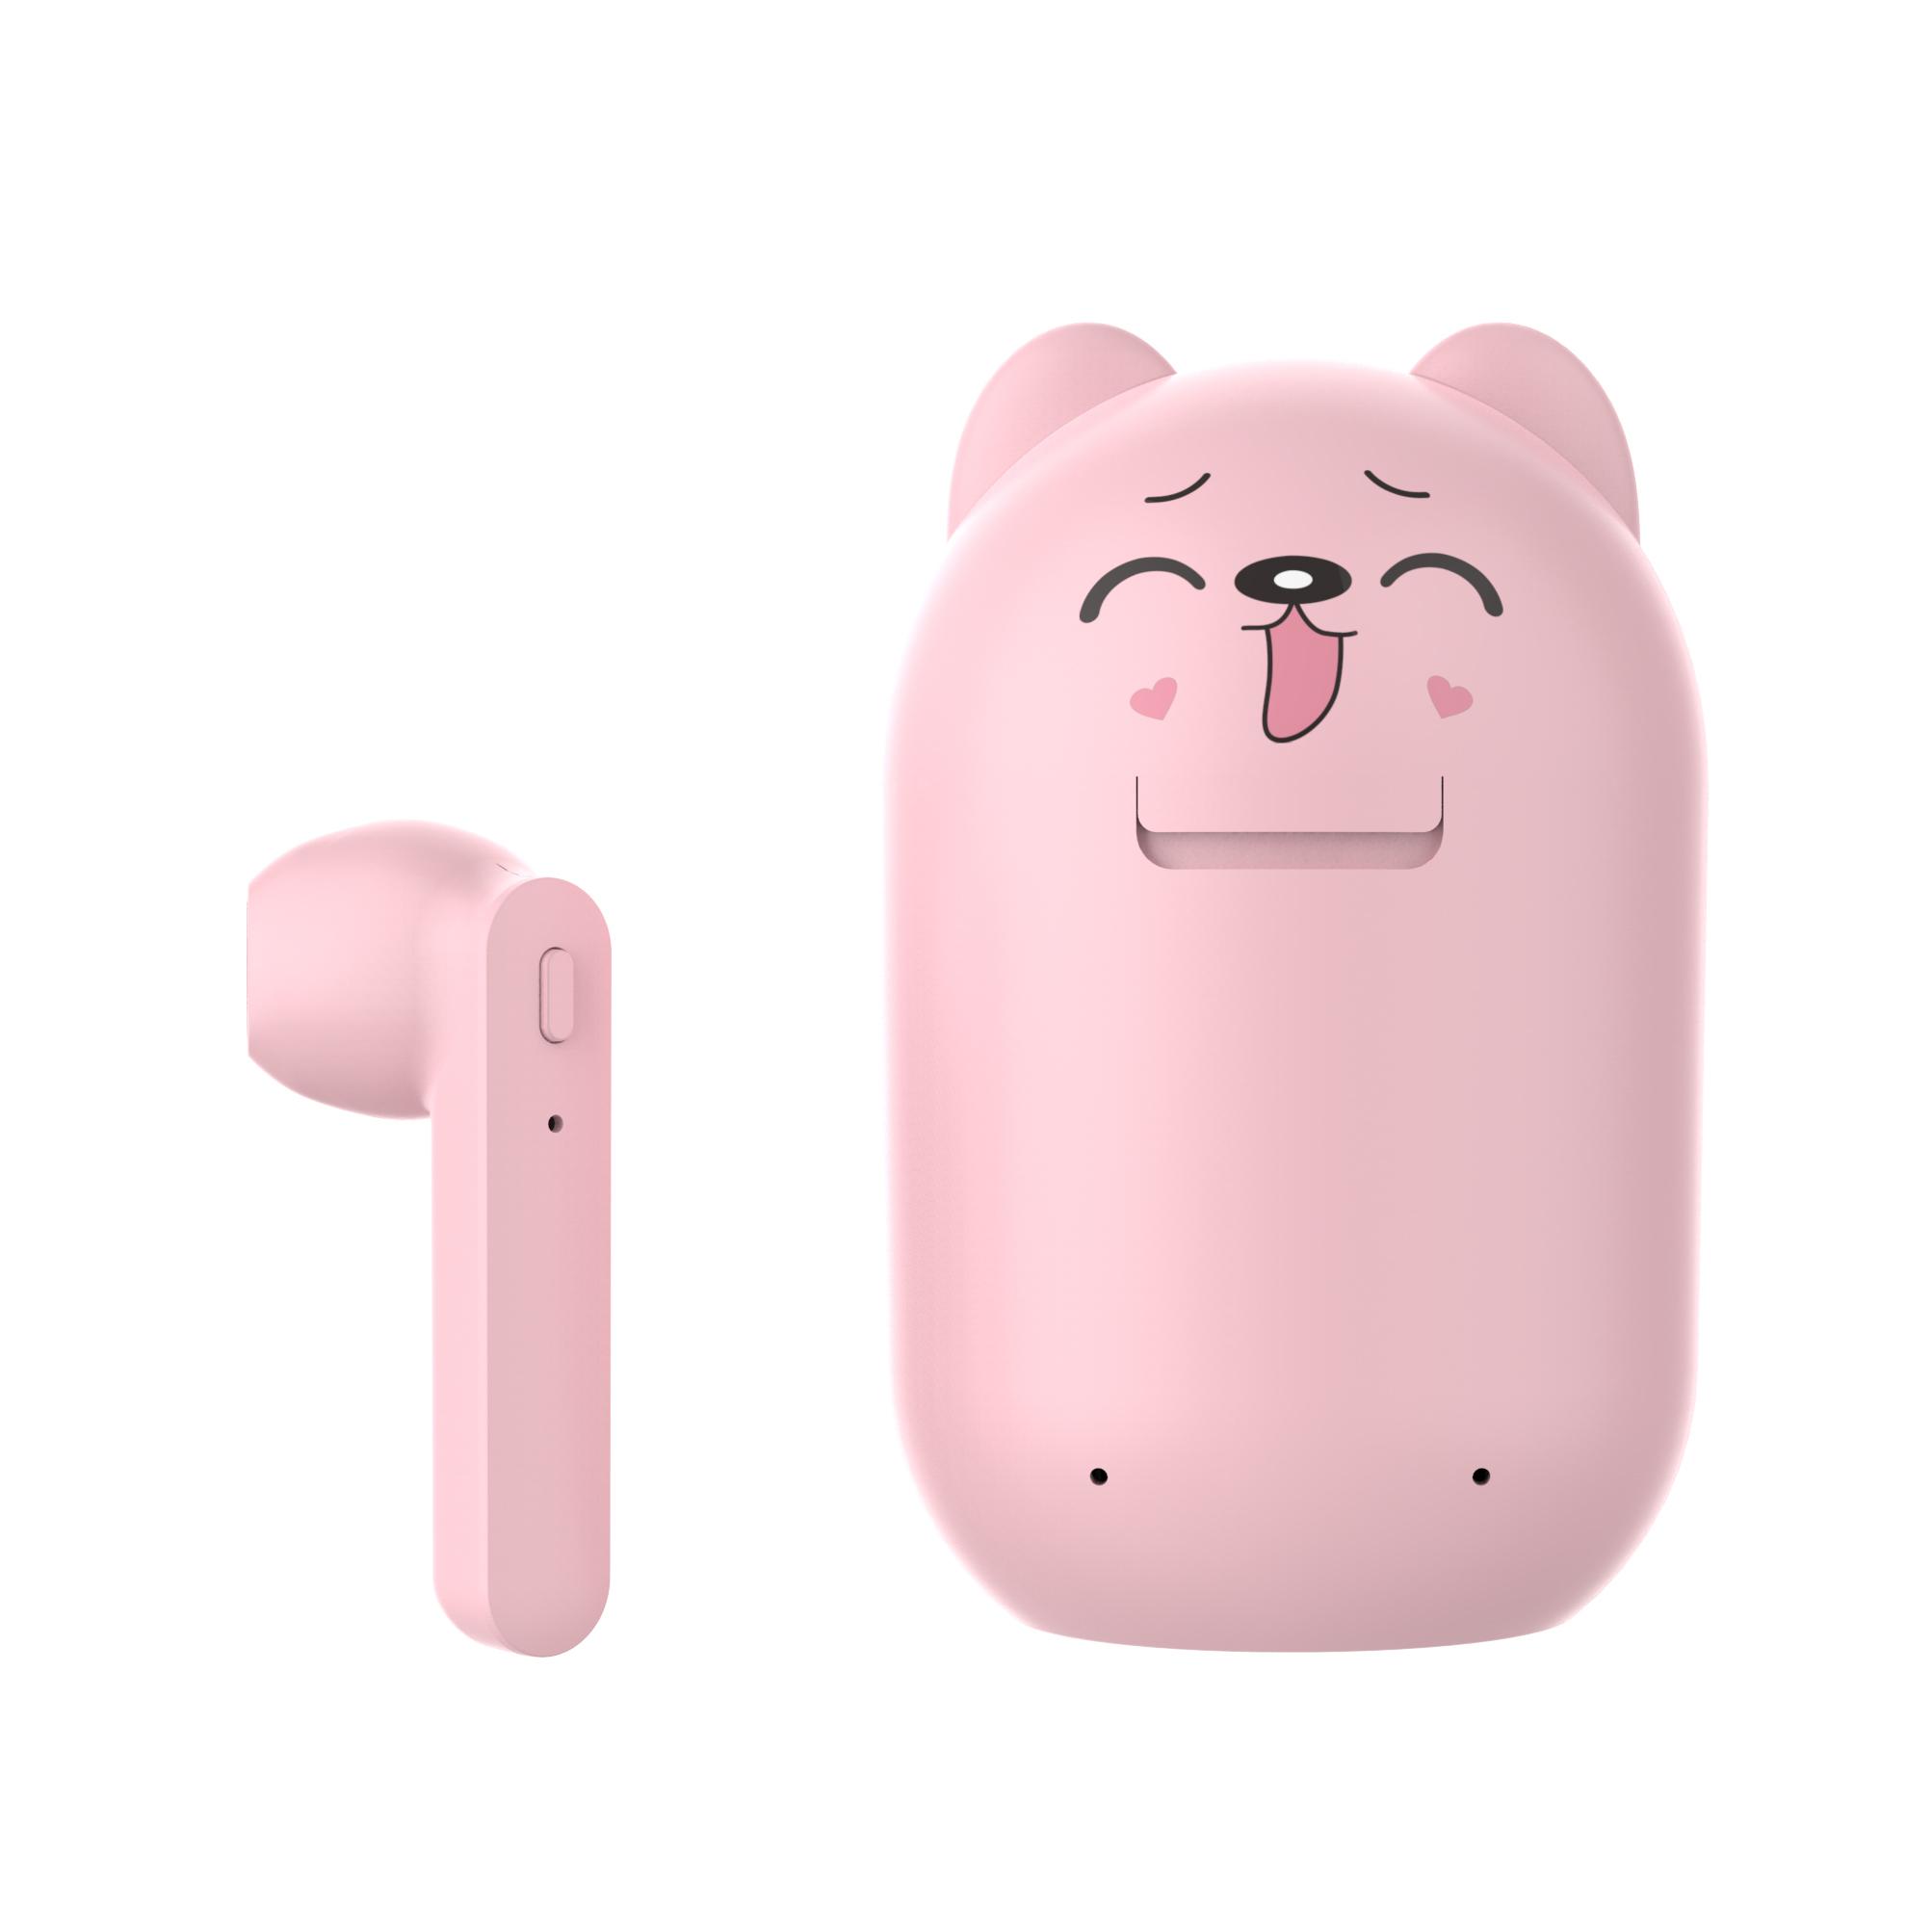 TWS Bluetooth Earphone 5.0 Running Stereo Cartoon Headset with Data Line Pink